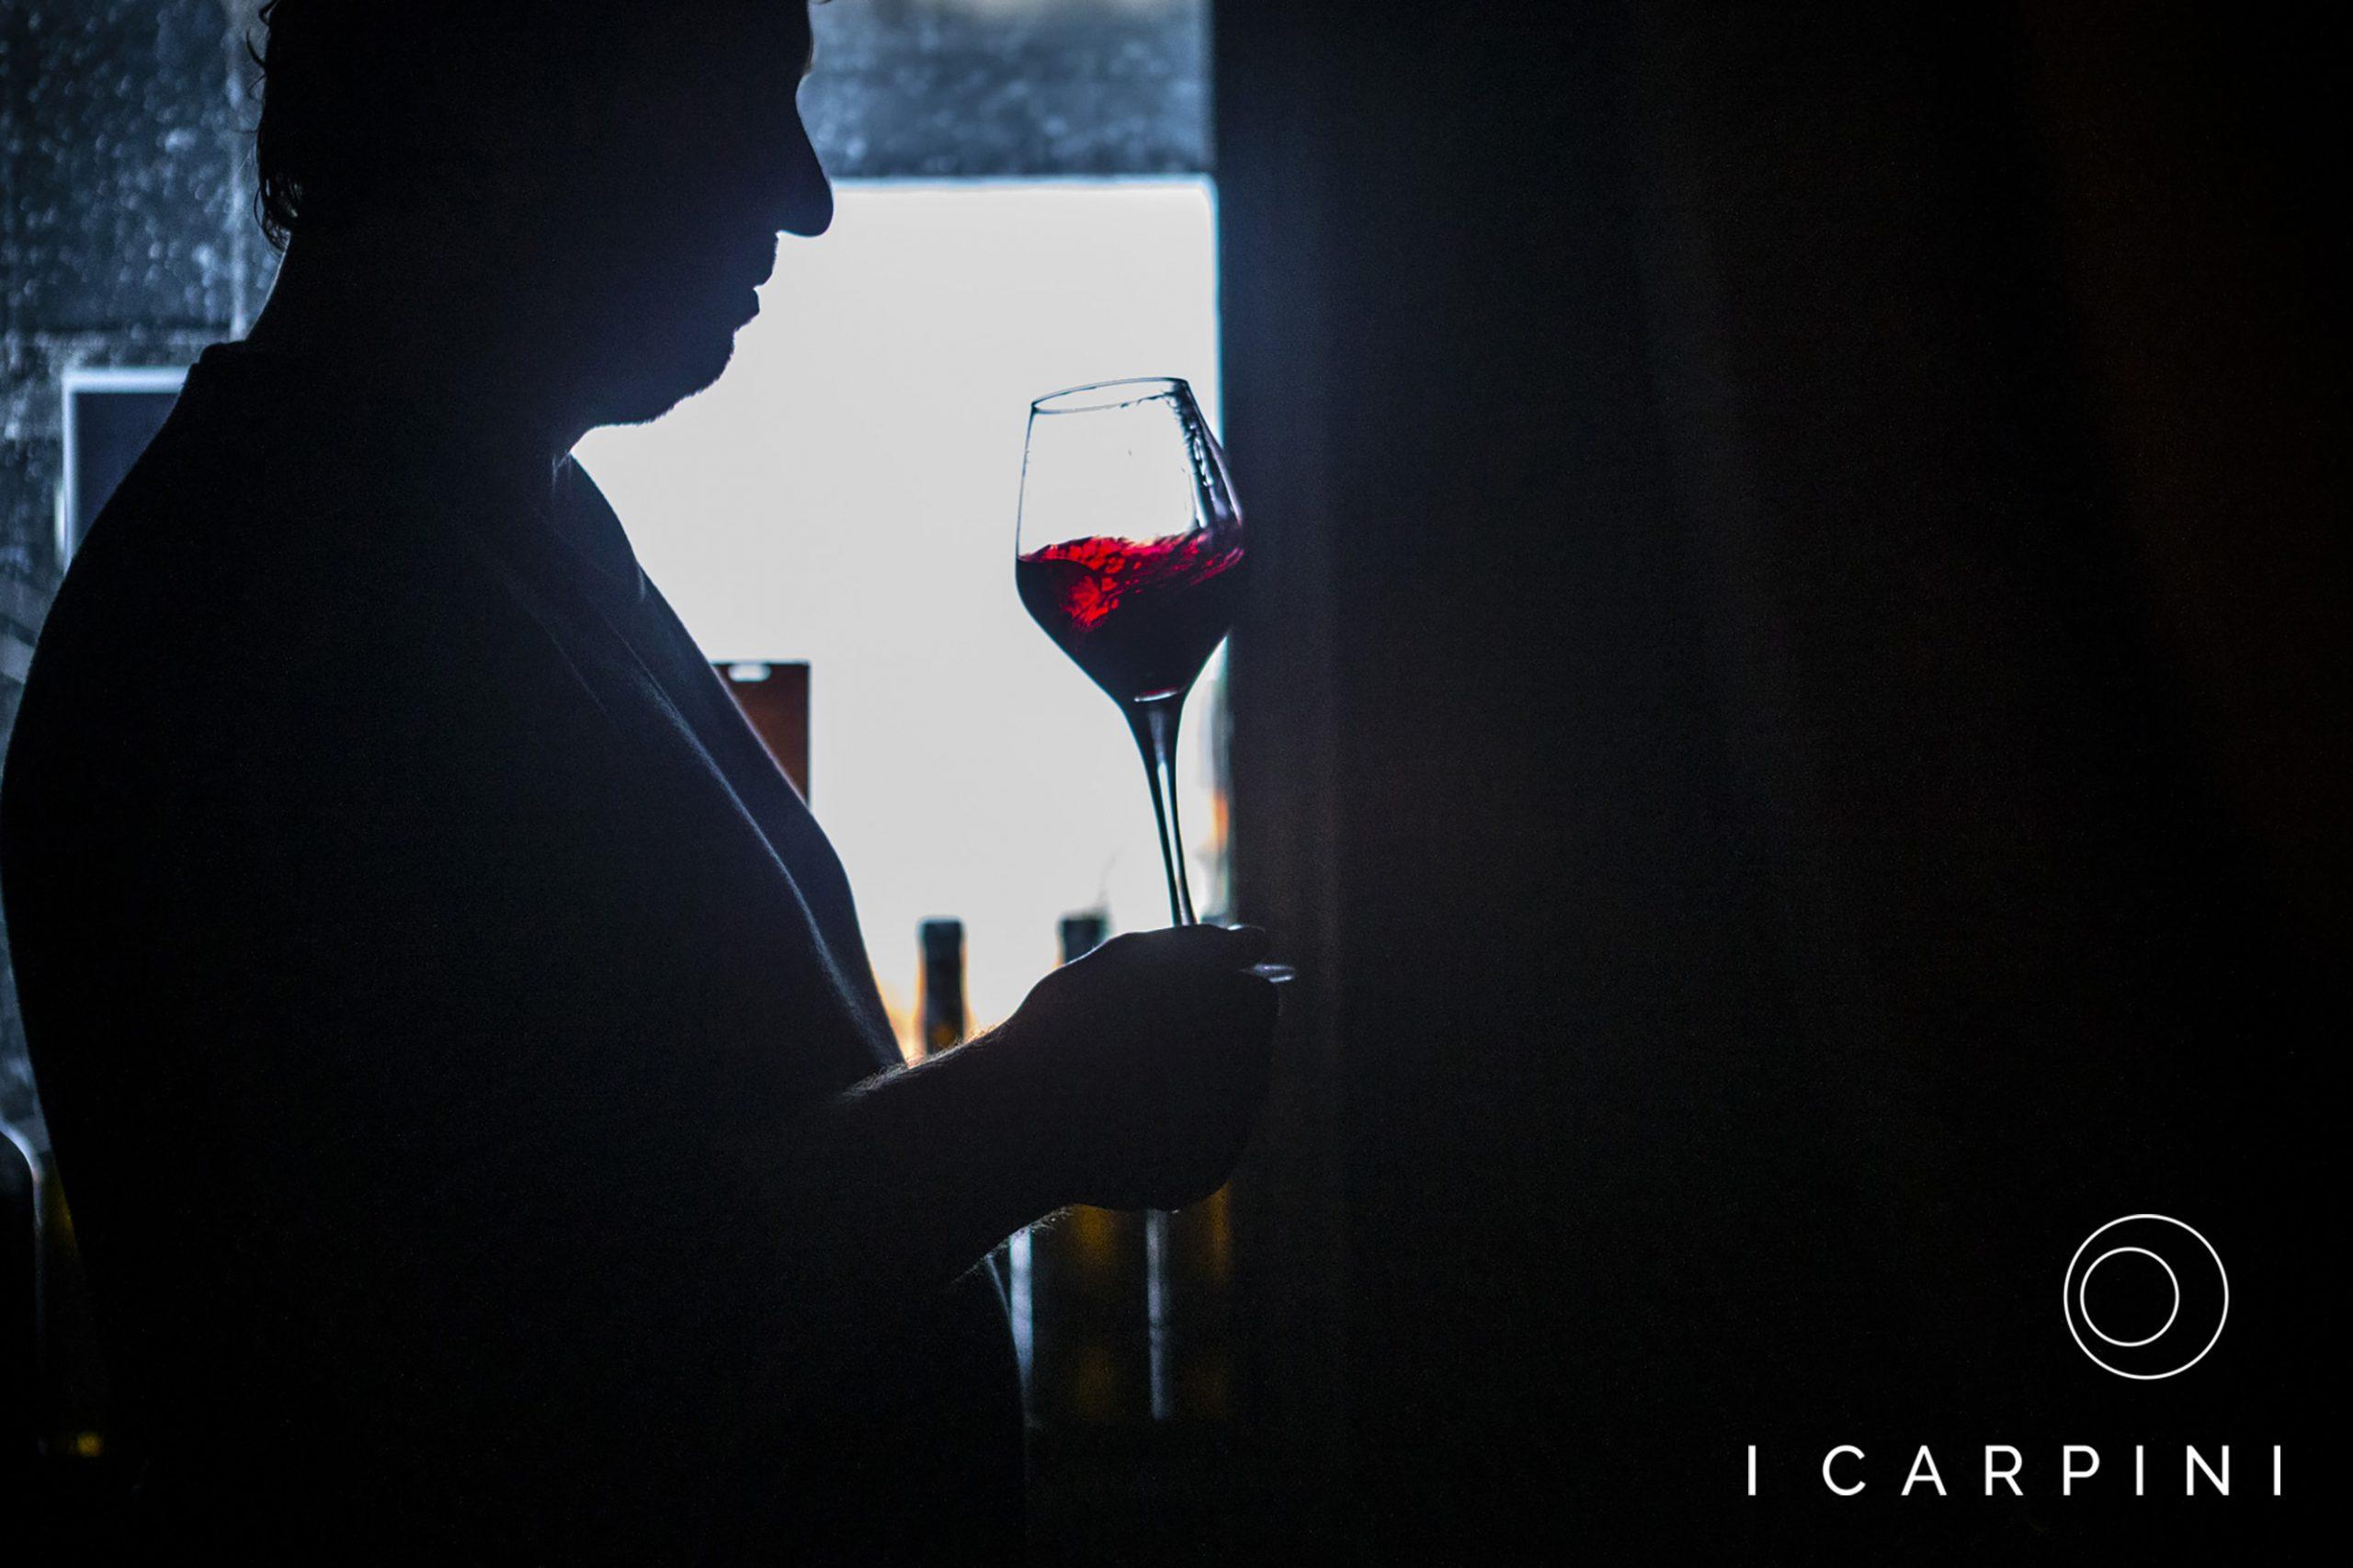 Cascina I Carpini_redwine tasting